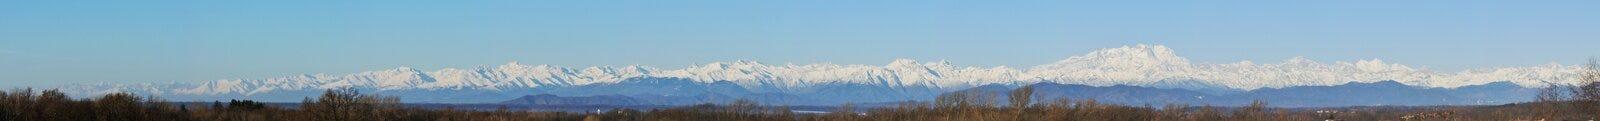 De bergketenpanorama van alpen Royalty-vrije Stock Foto